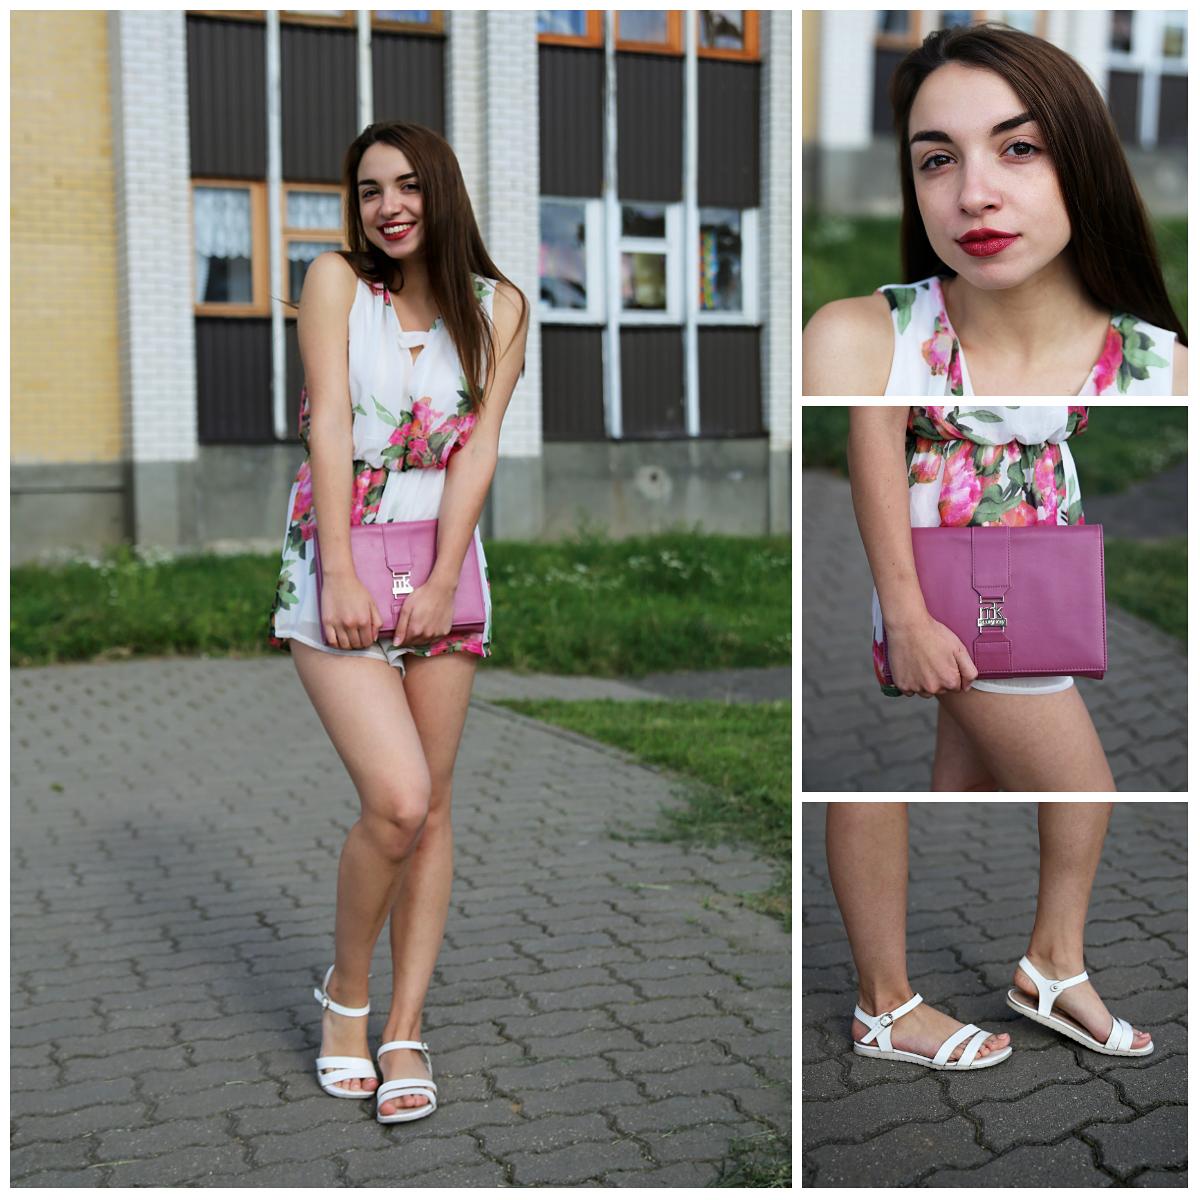 Дарья. Фото: Евгений ТИХАНОВИЧ